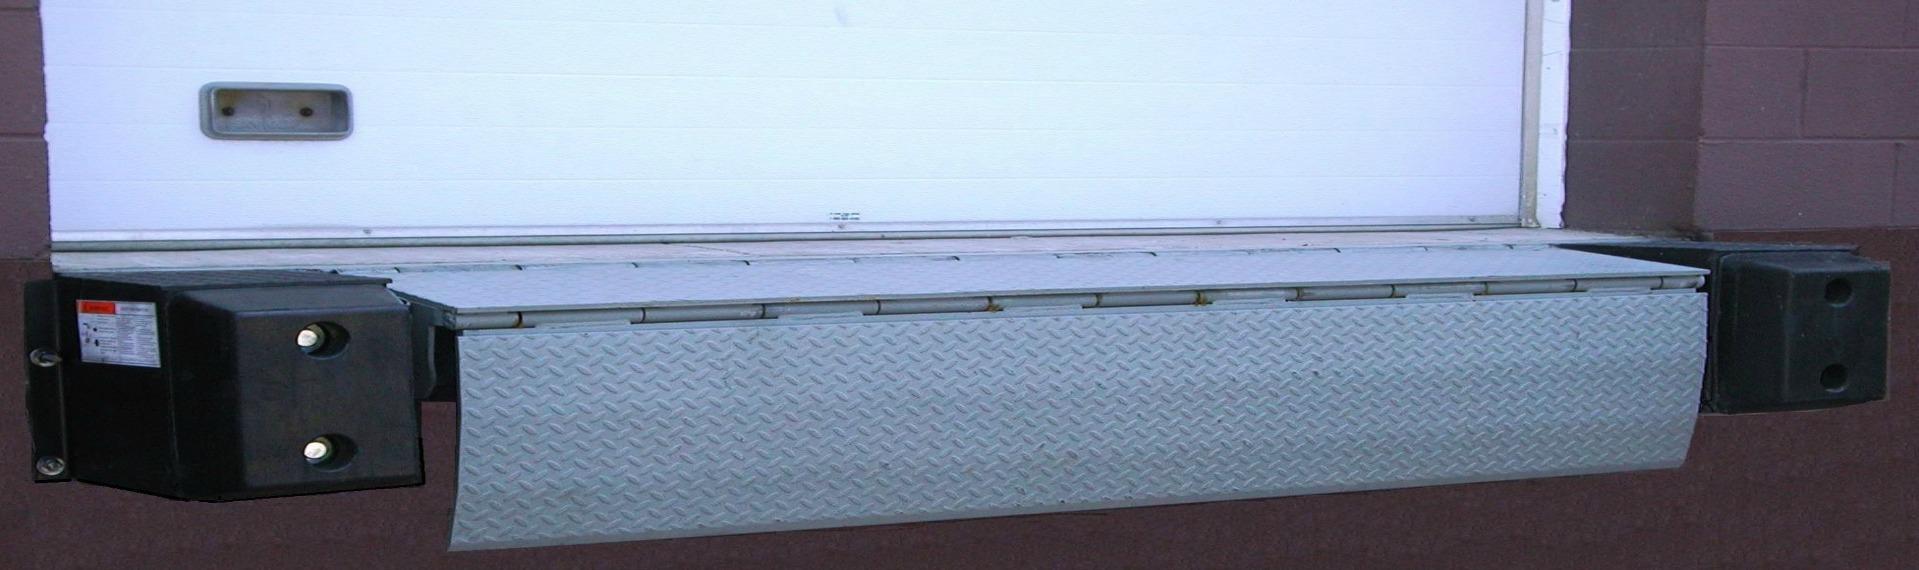 YARD-RAMP-SITE mechanical edge of dock leveler showing truck at dock loading